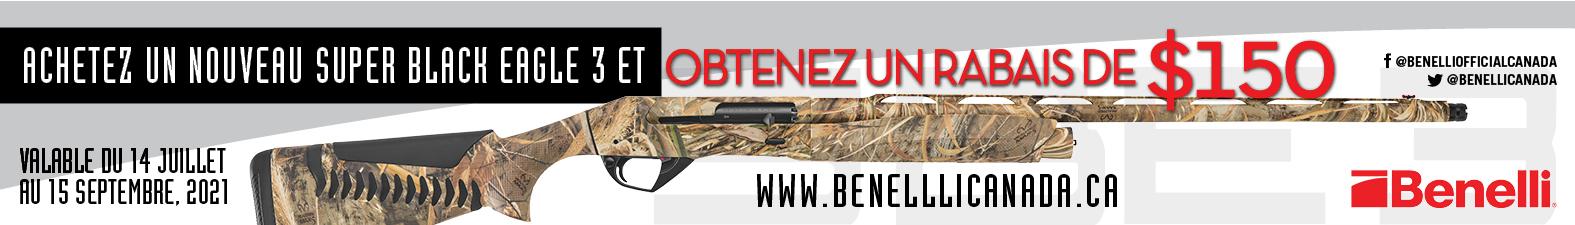 Benelli Promotion 2021 Banner 1 FR Max 5